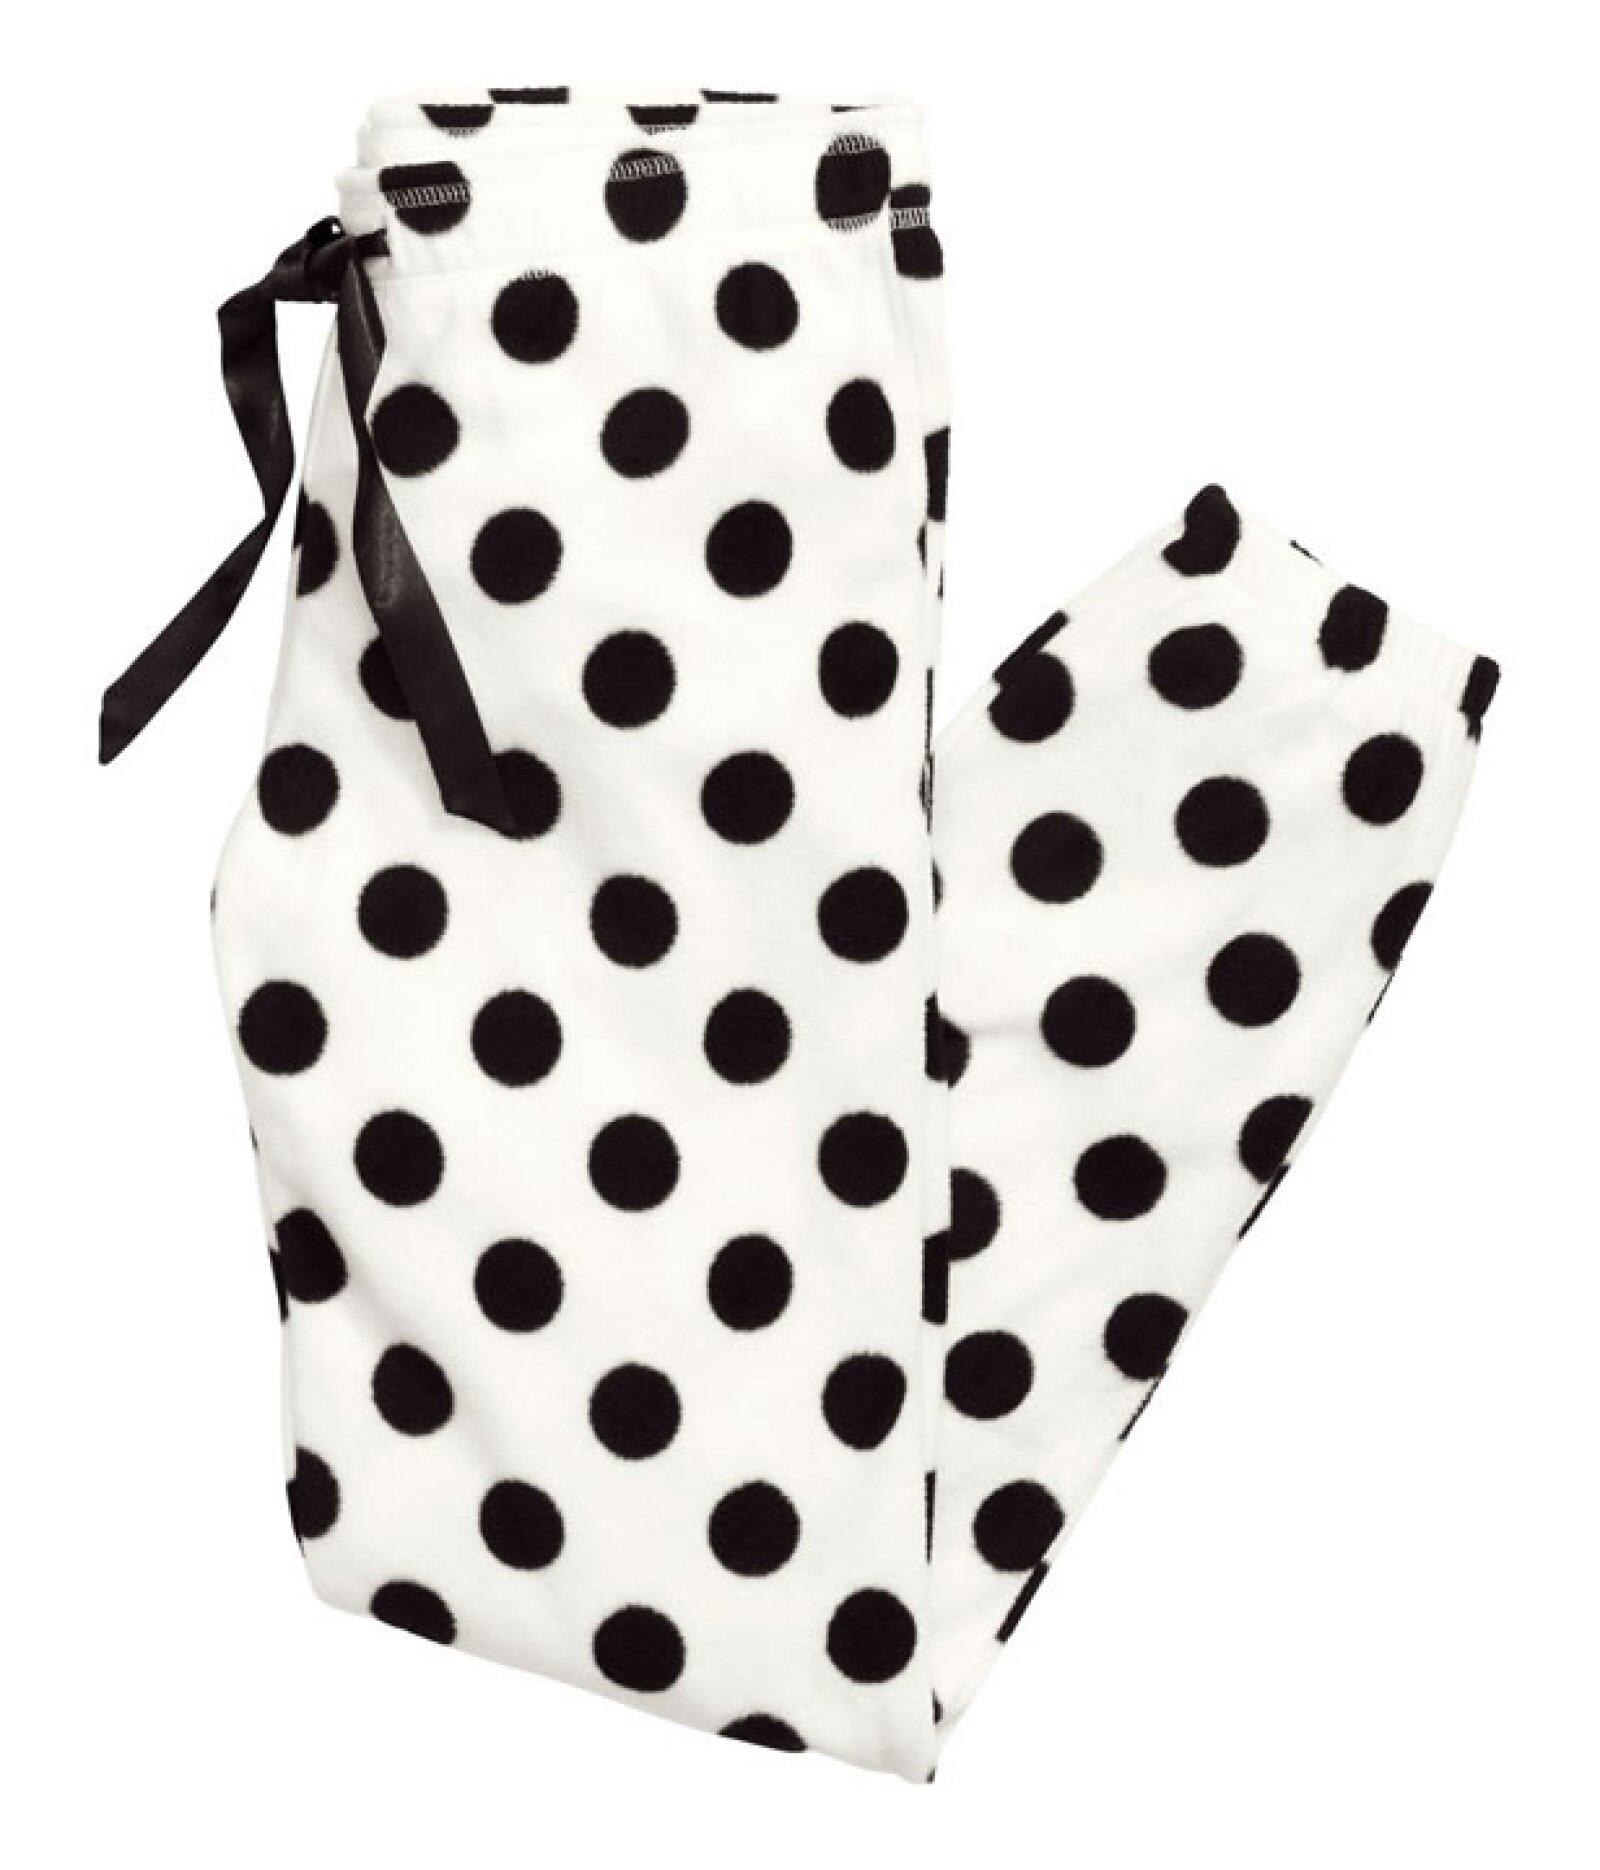 Pantalón Pijama de puntitos en forro polar. 249 pesos en H&M.